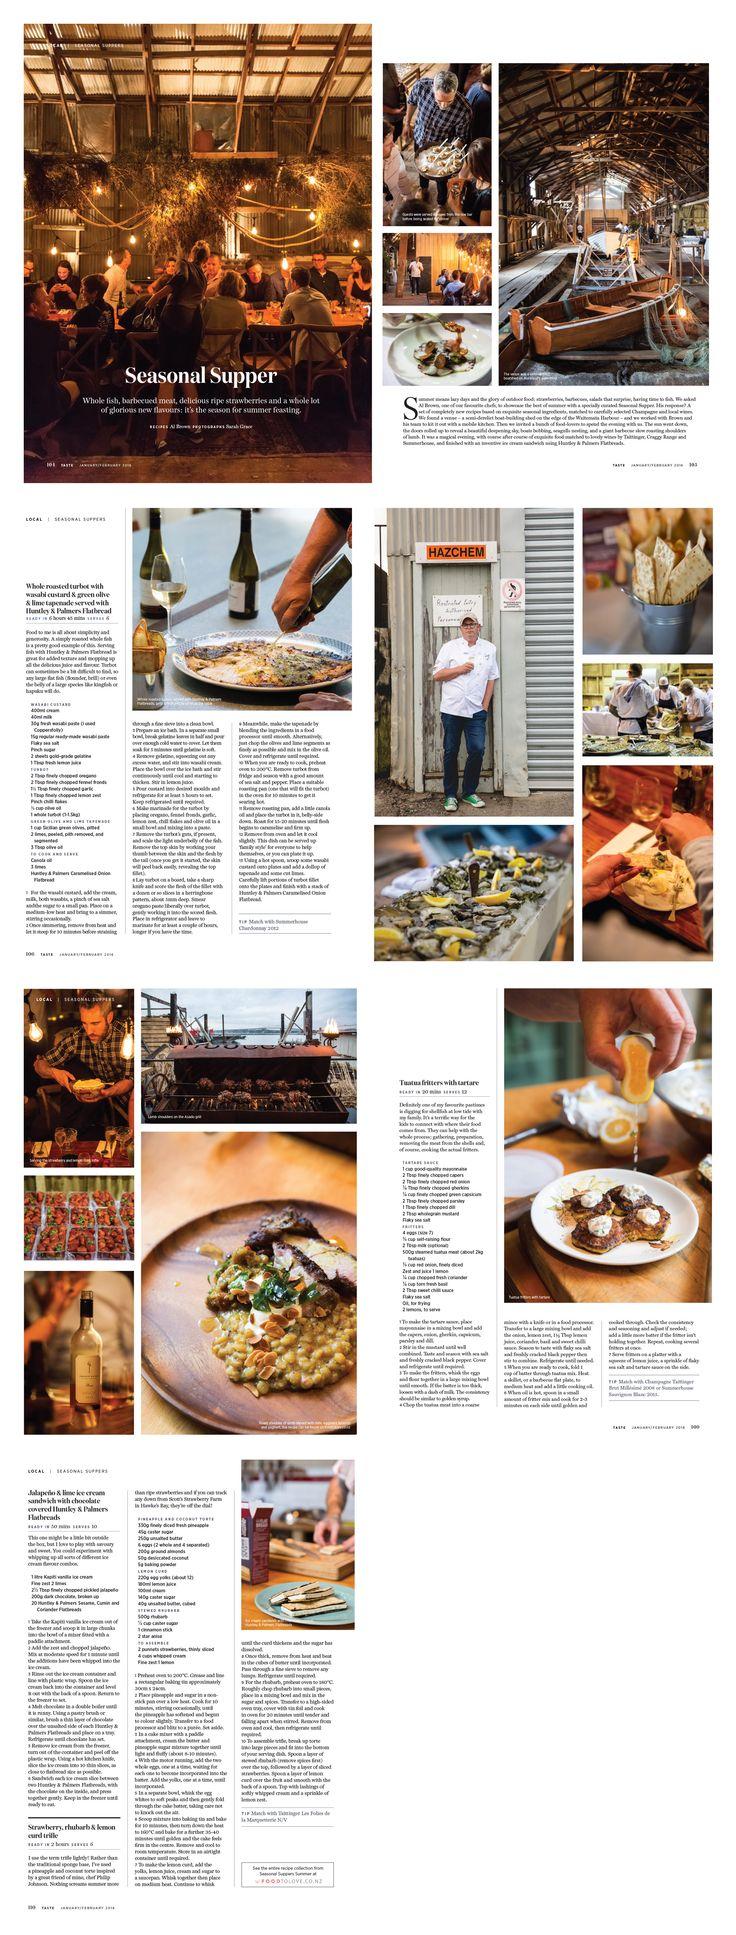 Seasonal Suppers feature in Taste magazine